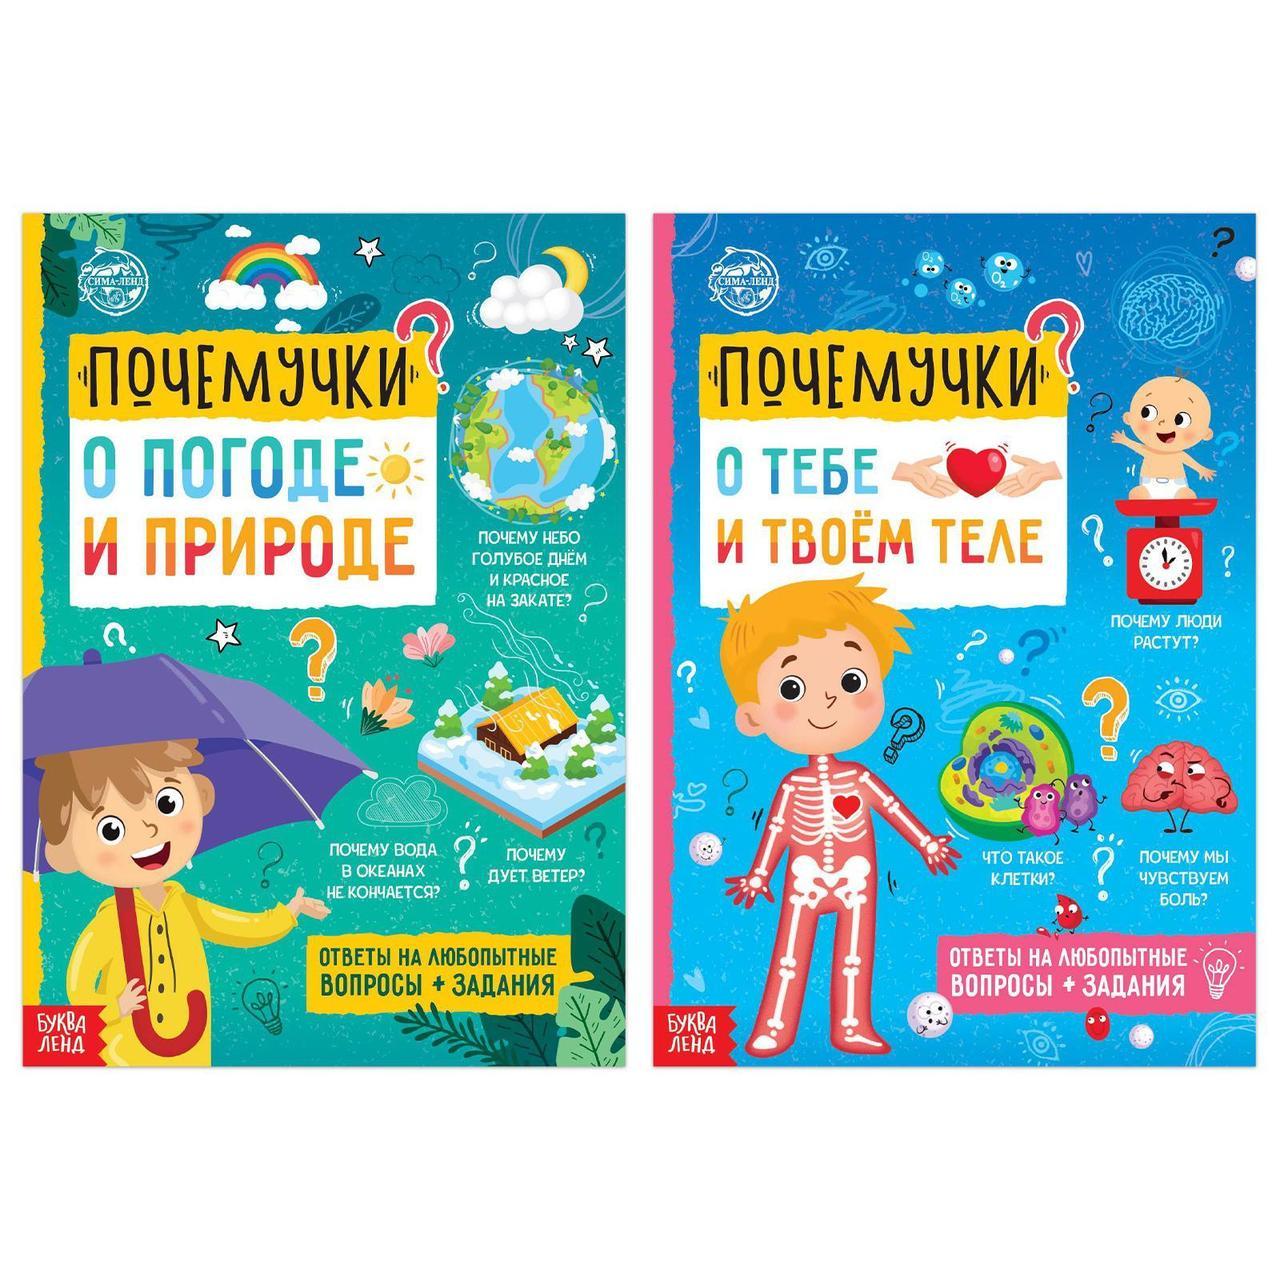 Набор обучающих книг «Почемучки: о человеке и природе», 2 шт. по 16 стр.